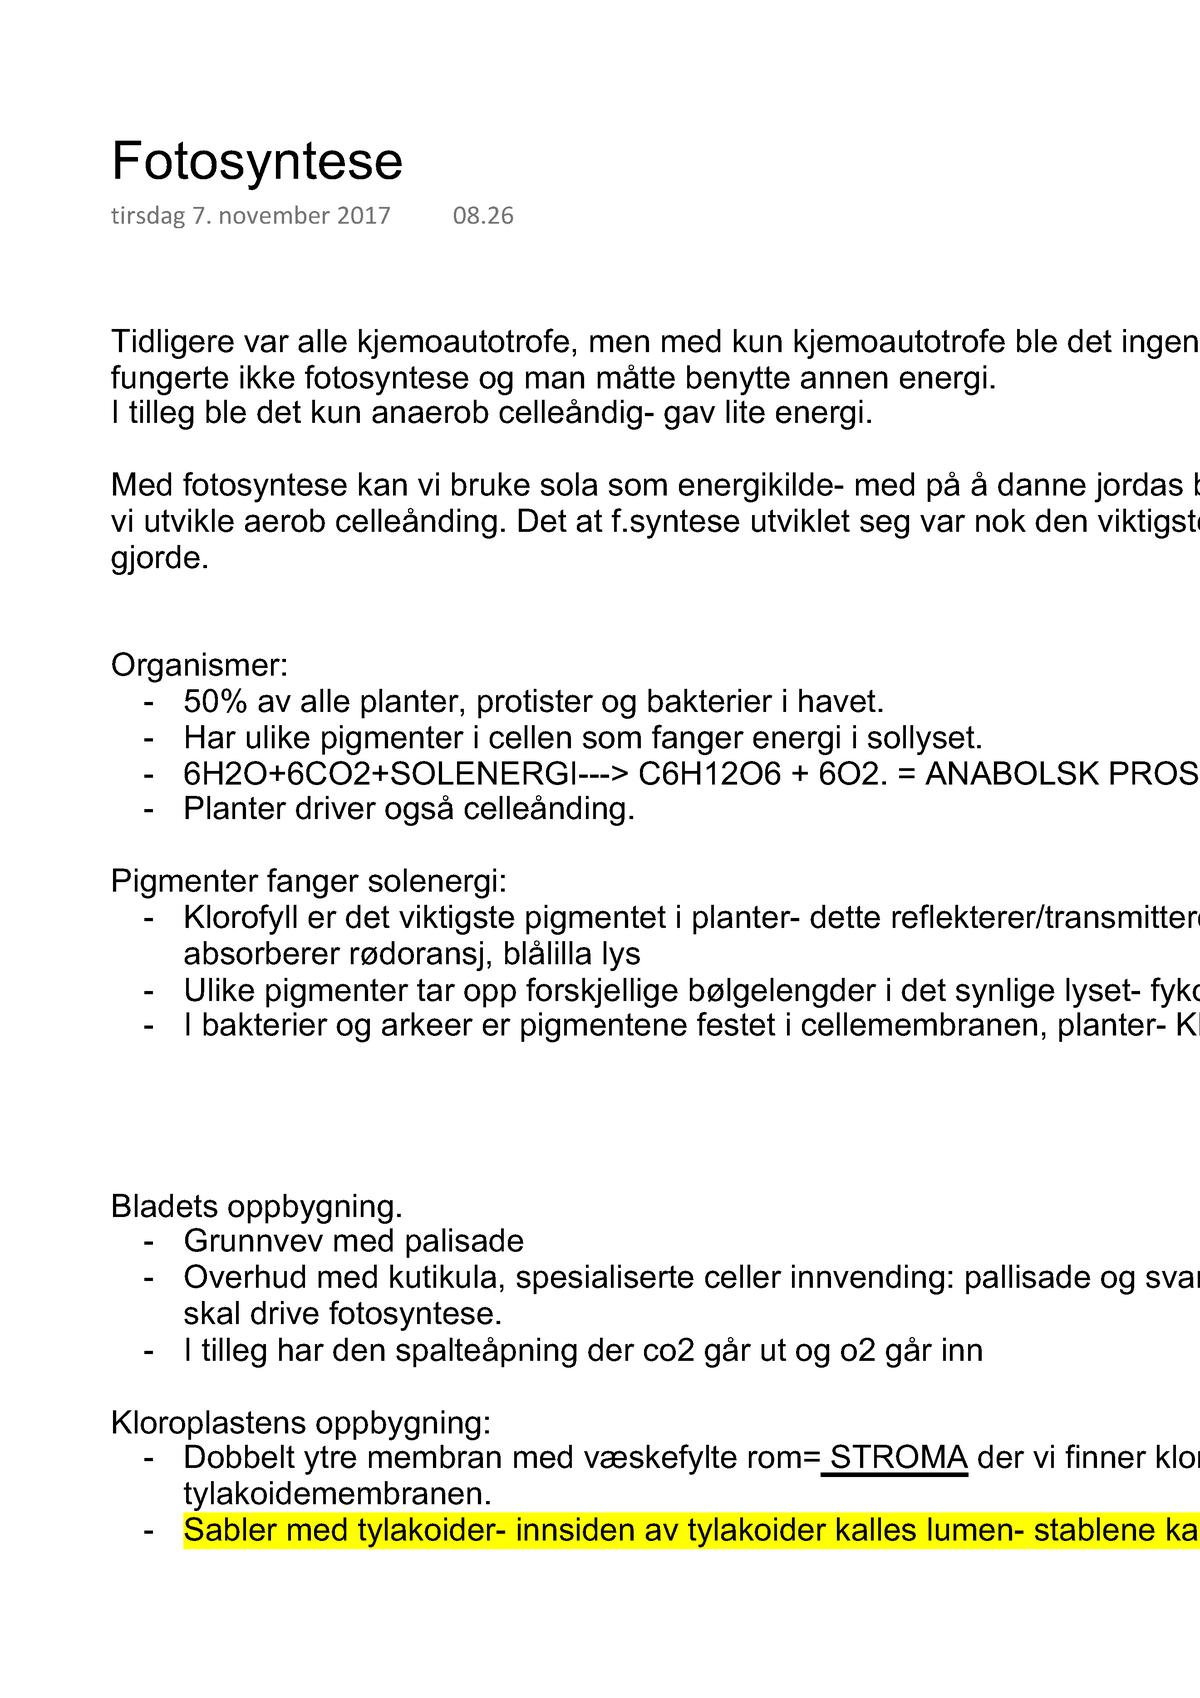 9101a2ed Fotosyntese - Foredragsnotater 6 - BIO1000: Grunnkurs i biologi - StuDocu